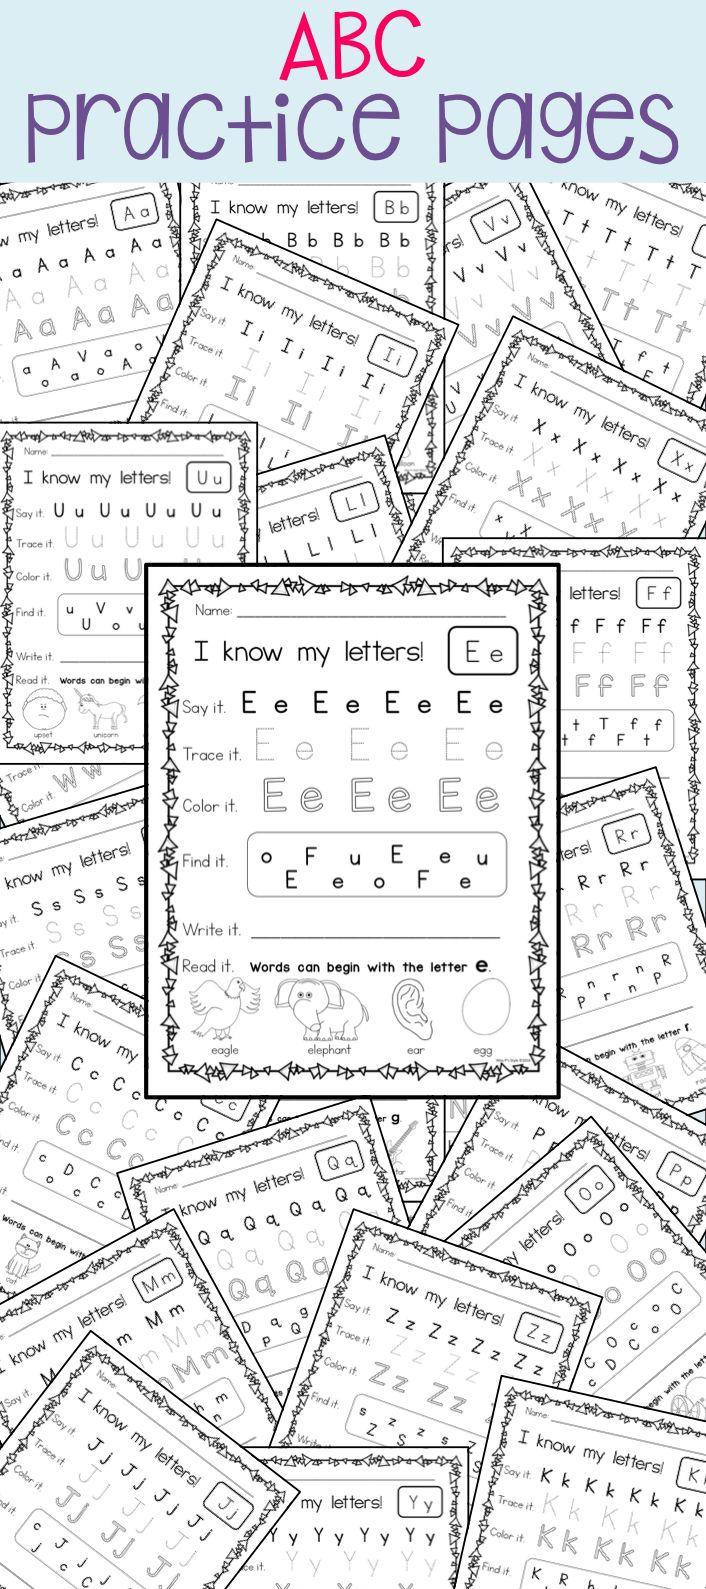 worksheet Kindergarten Abc Worksheets best 25 abc worksheets ideas on pinterest preschool letter practice pages